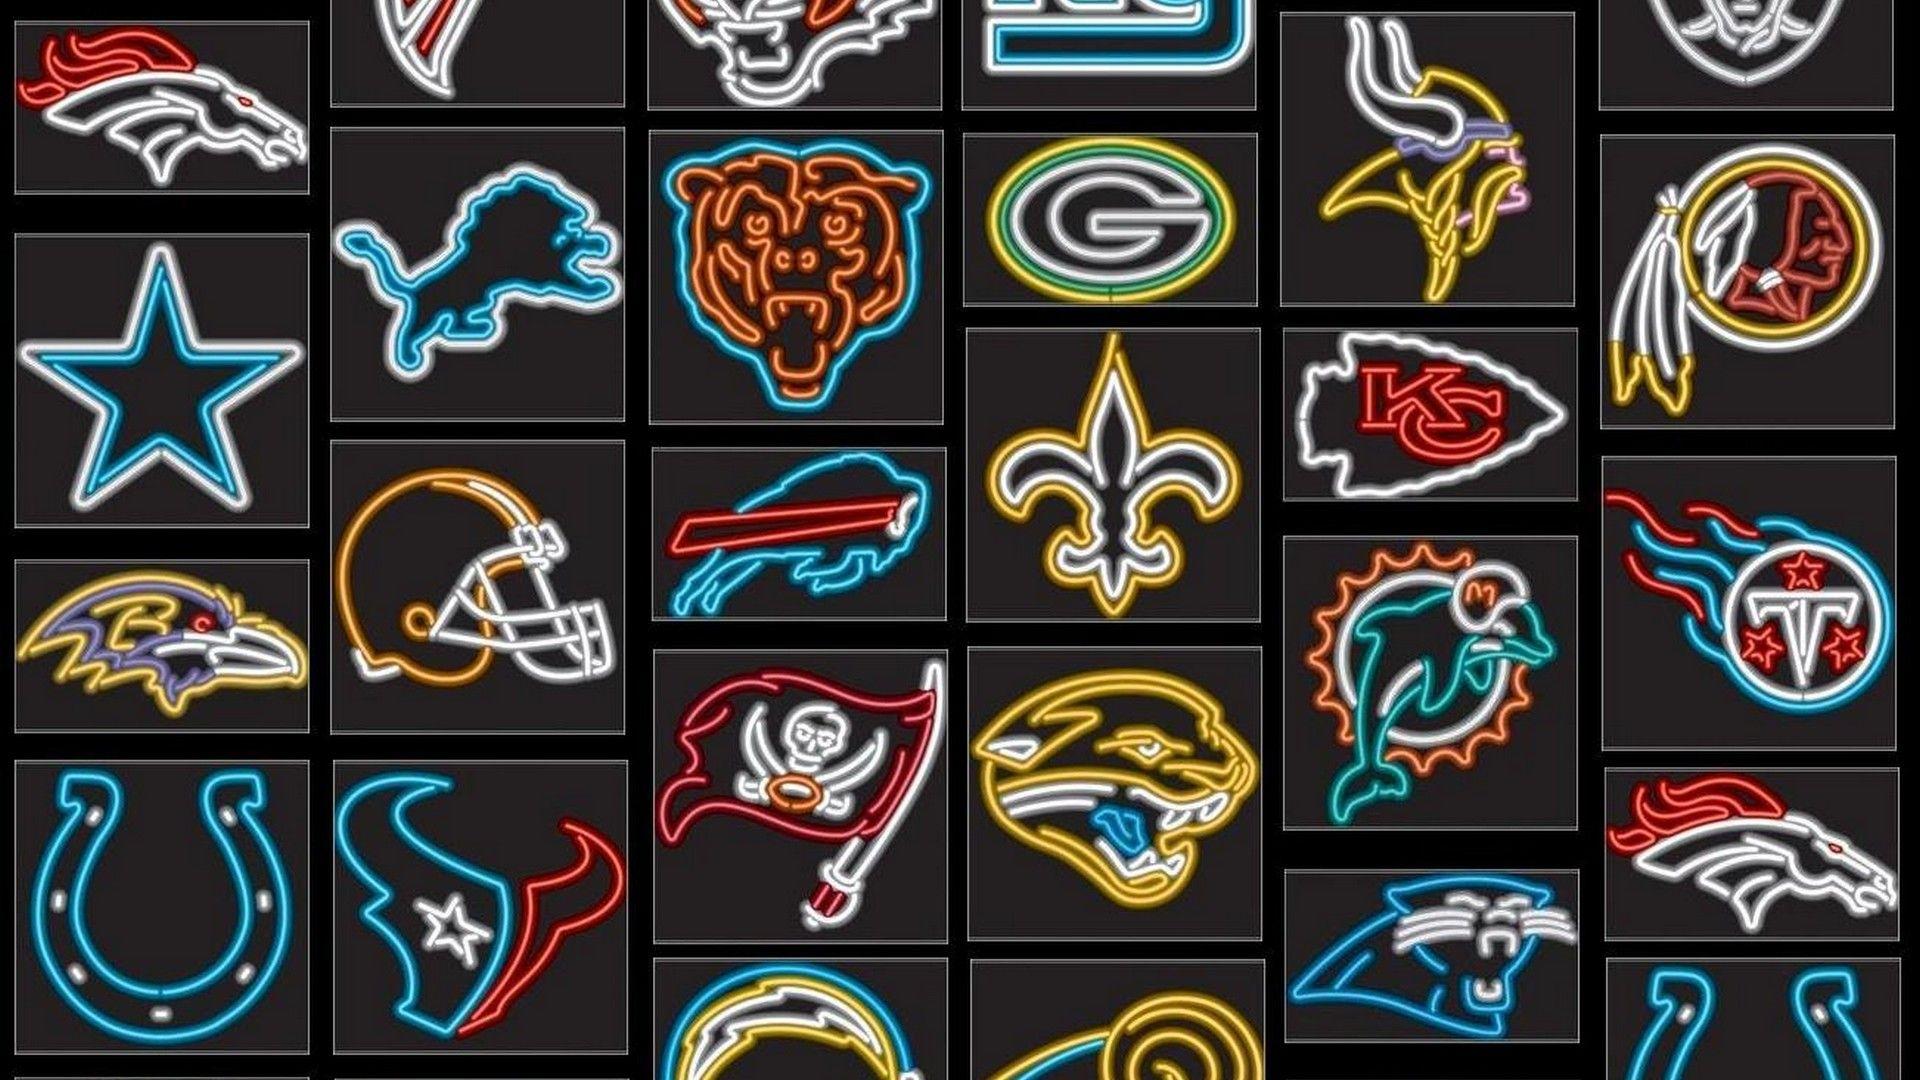 Nfl Wallpapers Nfl Football Wallpaper Nfl American Football